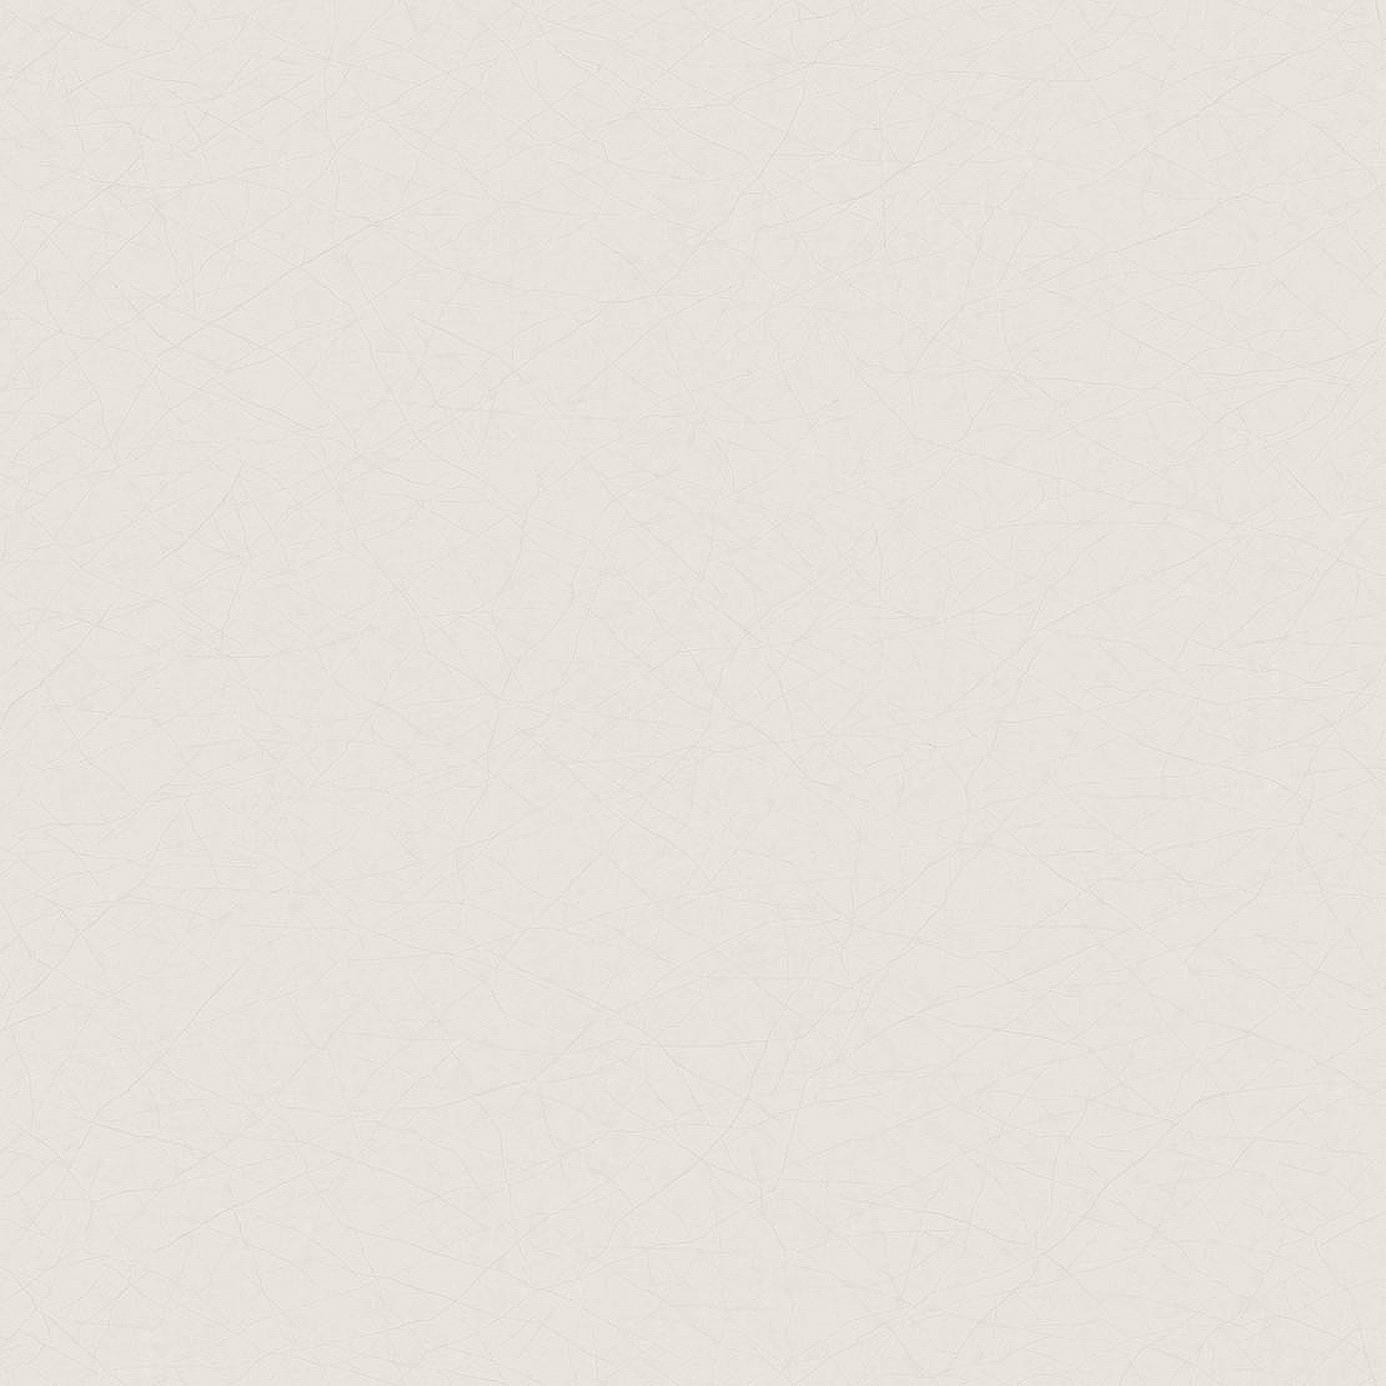 Французские обои Casadeco,  коллекция So White 2, артикулSWI21079113